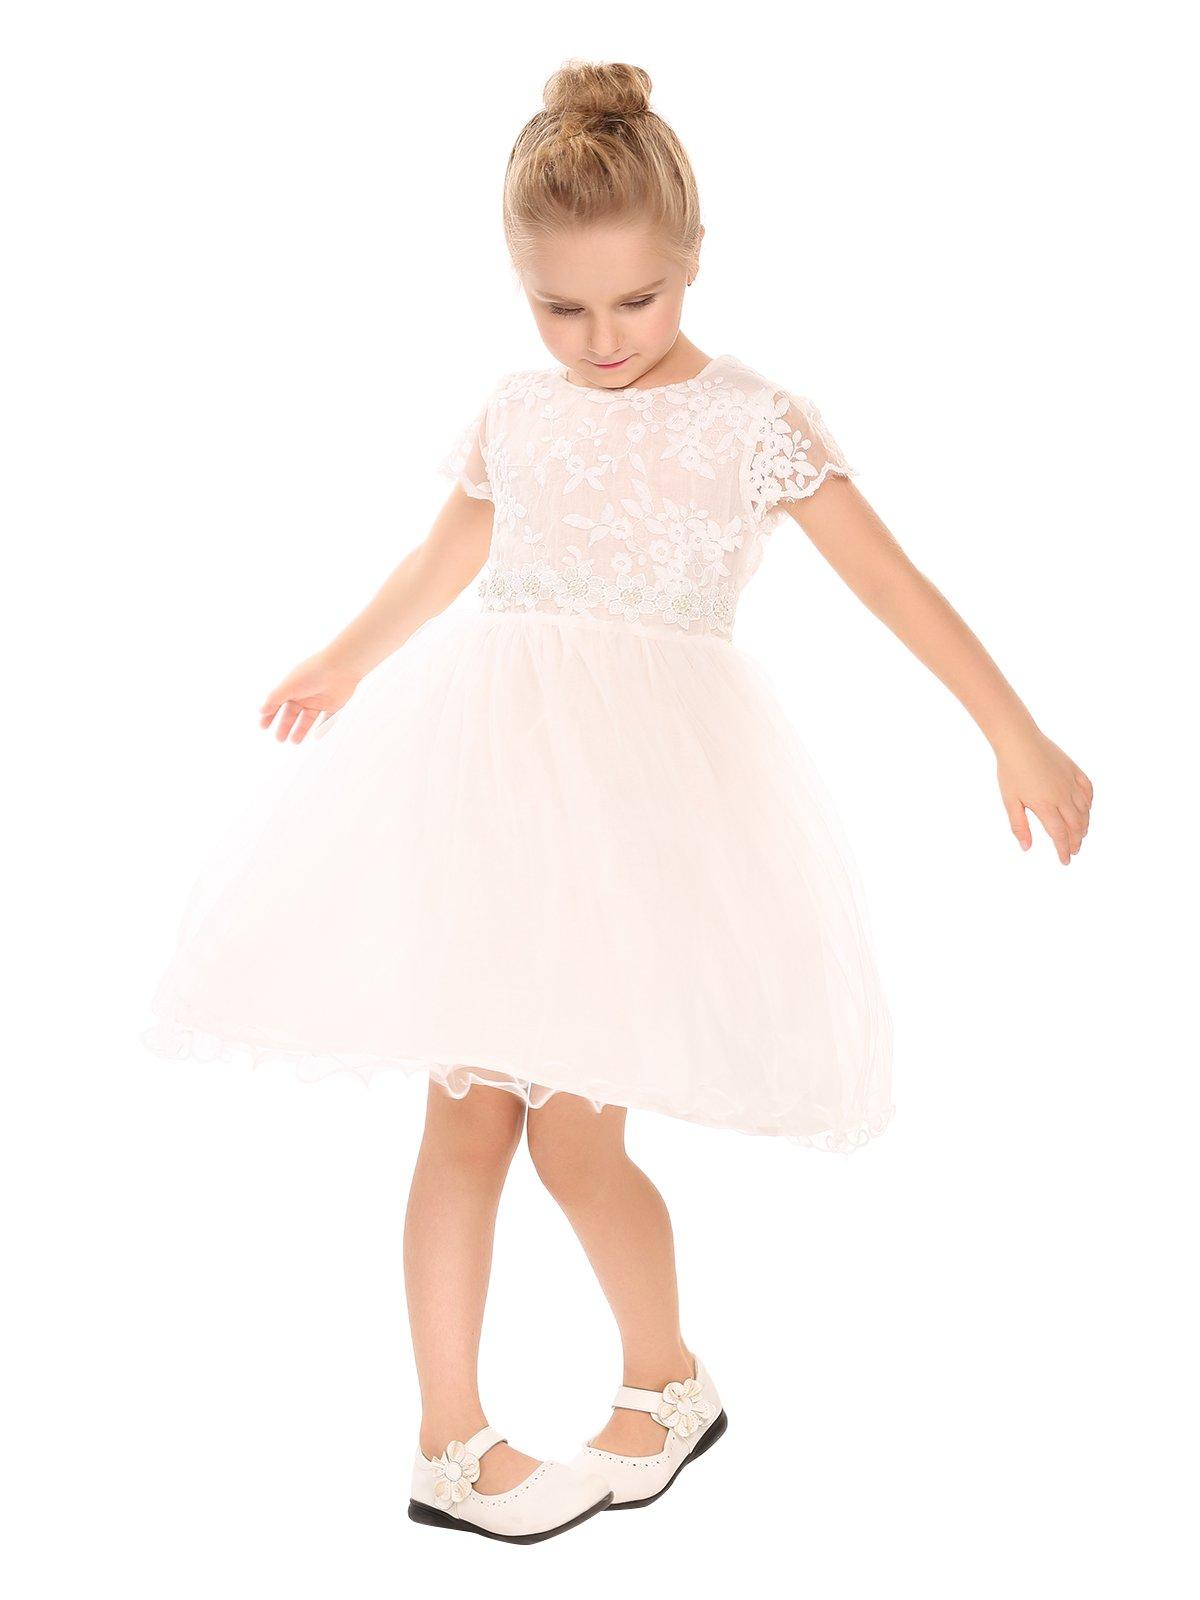 Arshiner Girls Lace Dress Princess Party Tutu Dresses White 140